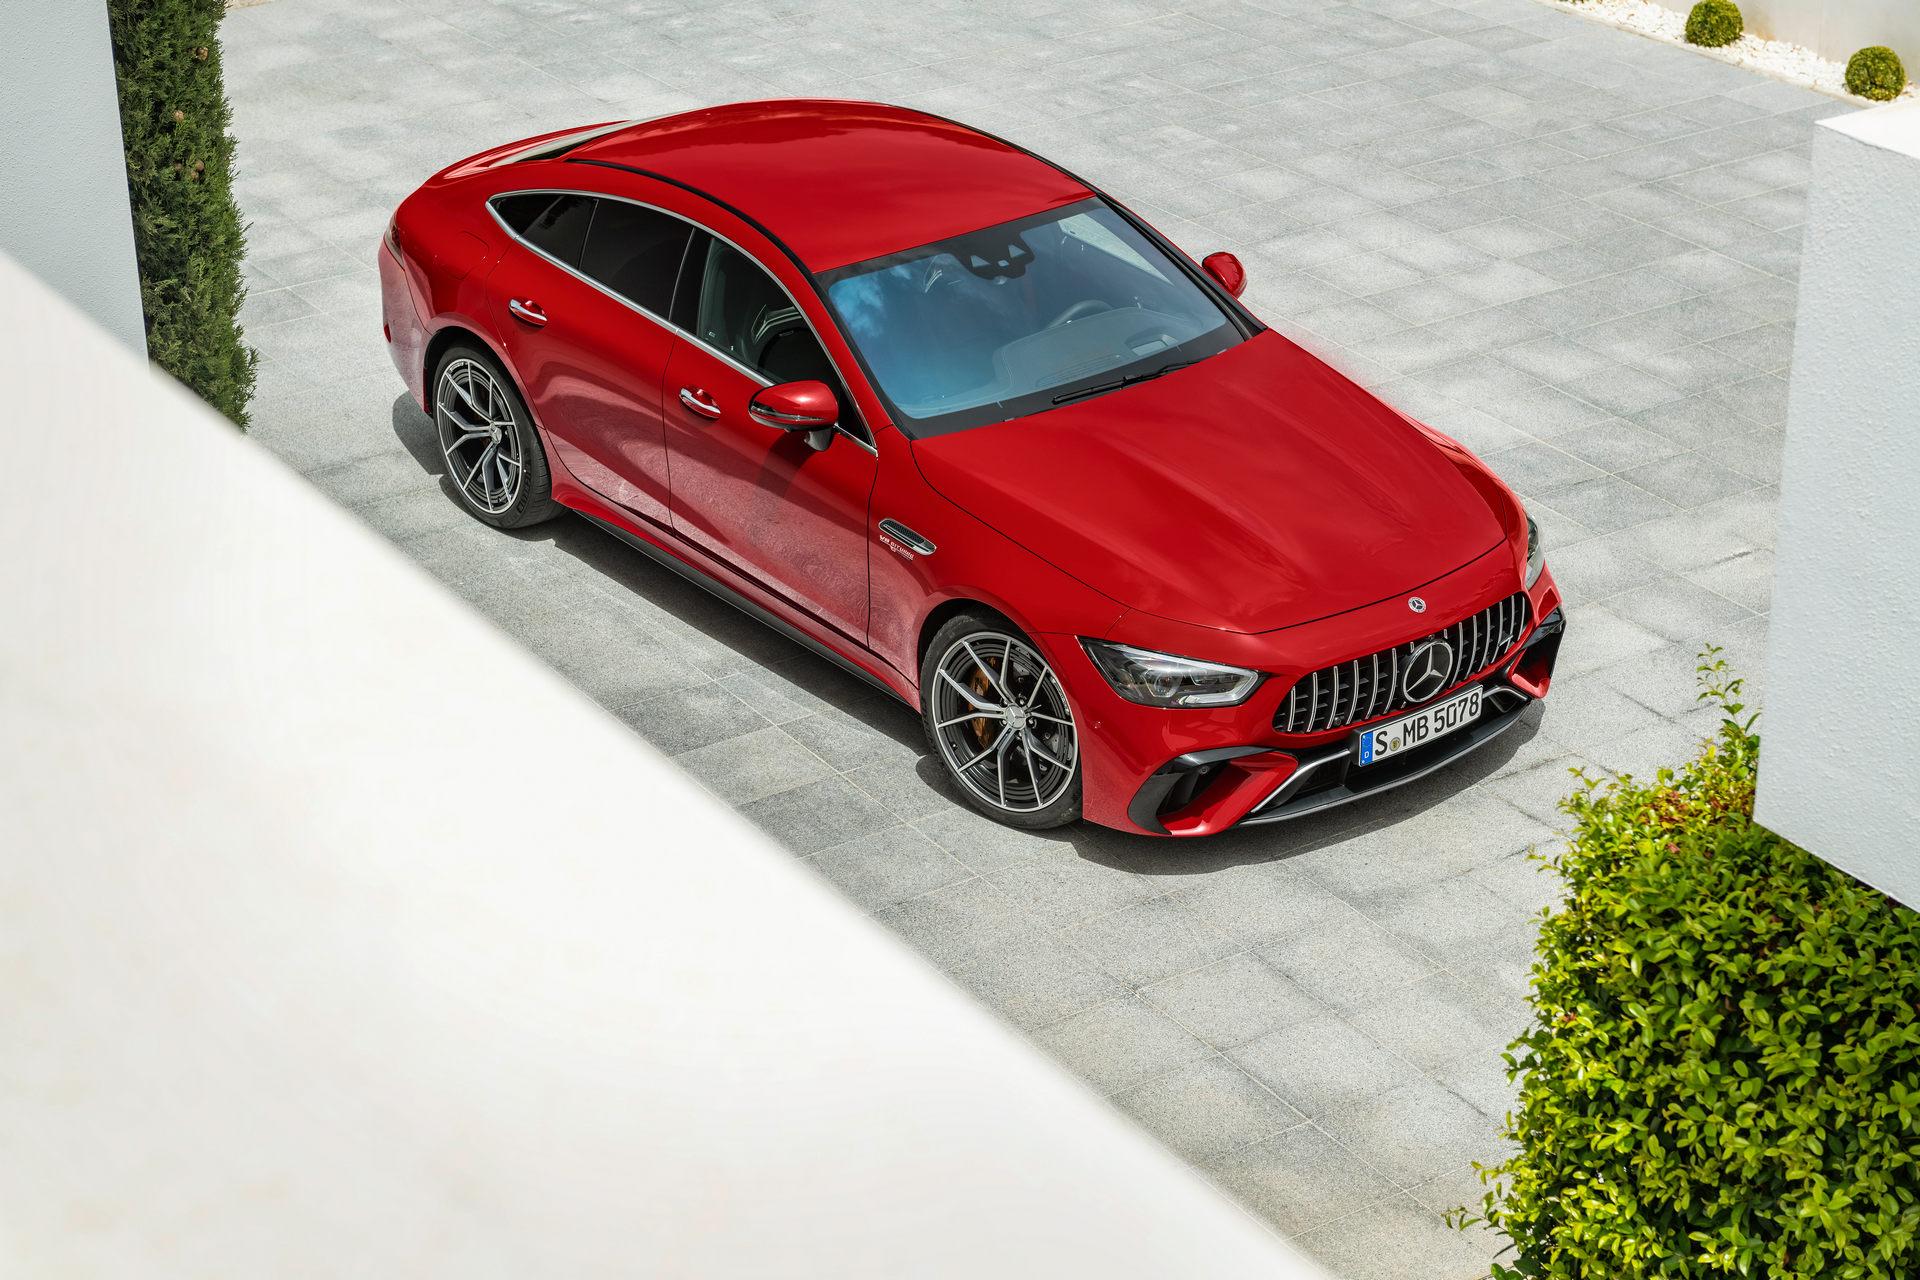 H Mercedes-Benz παρουσίασε το ισχυρότερο όχημα παραγωγής της (video)